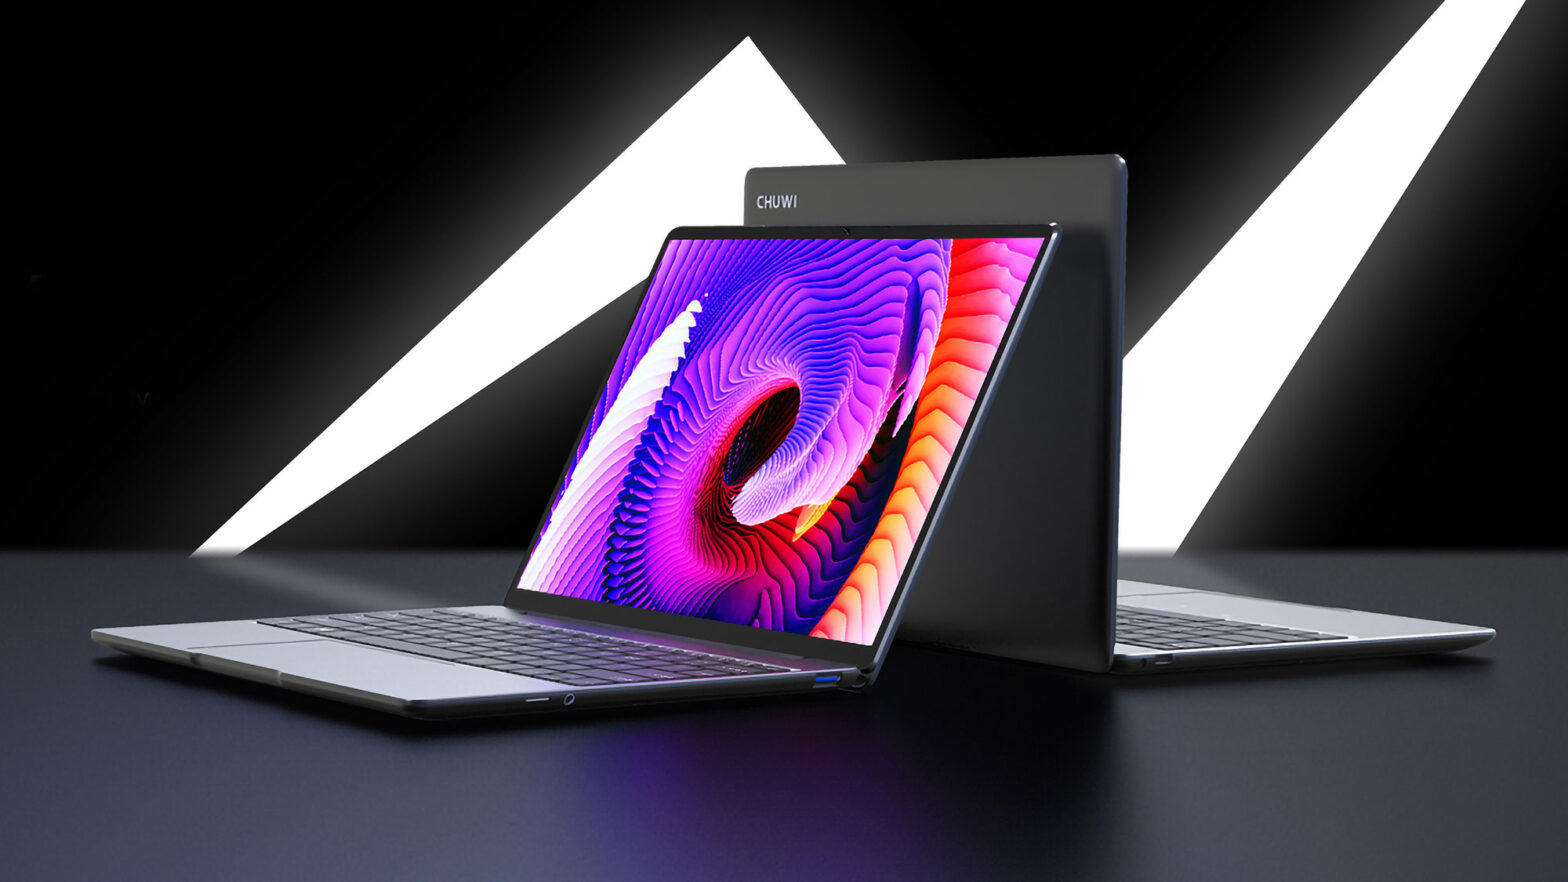 Chuwi Corebook Pro 13-inch Laptop